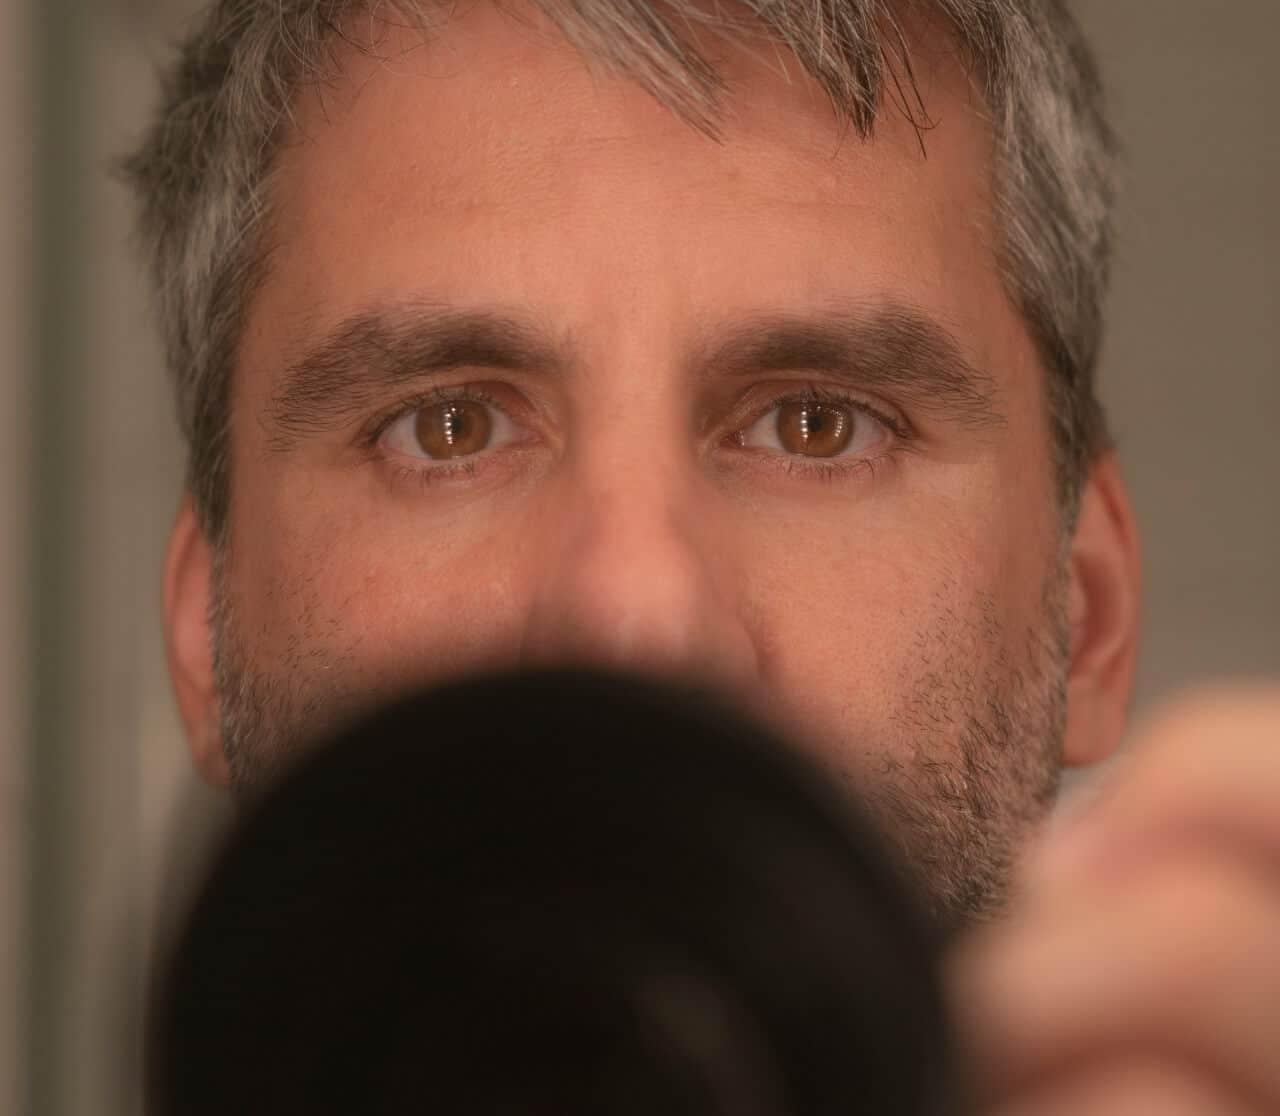 Desafios e oportunidades da carreira de videomaker